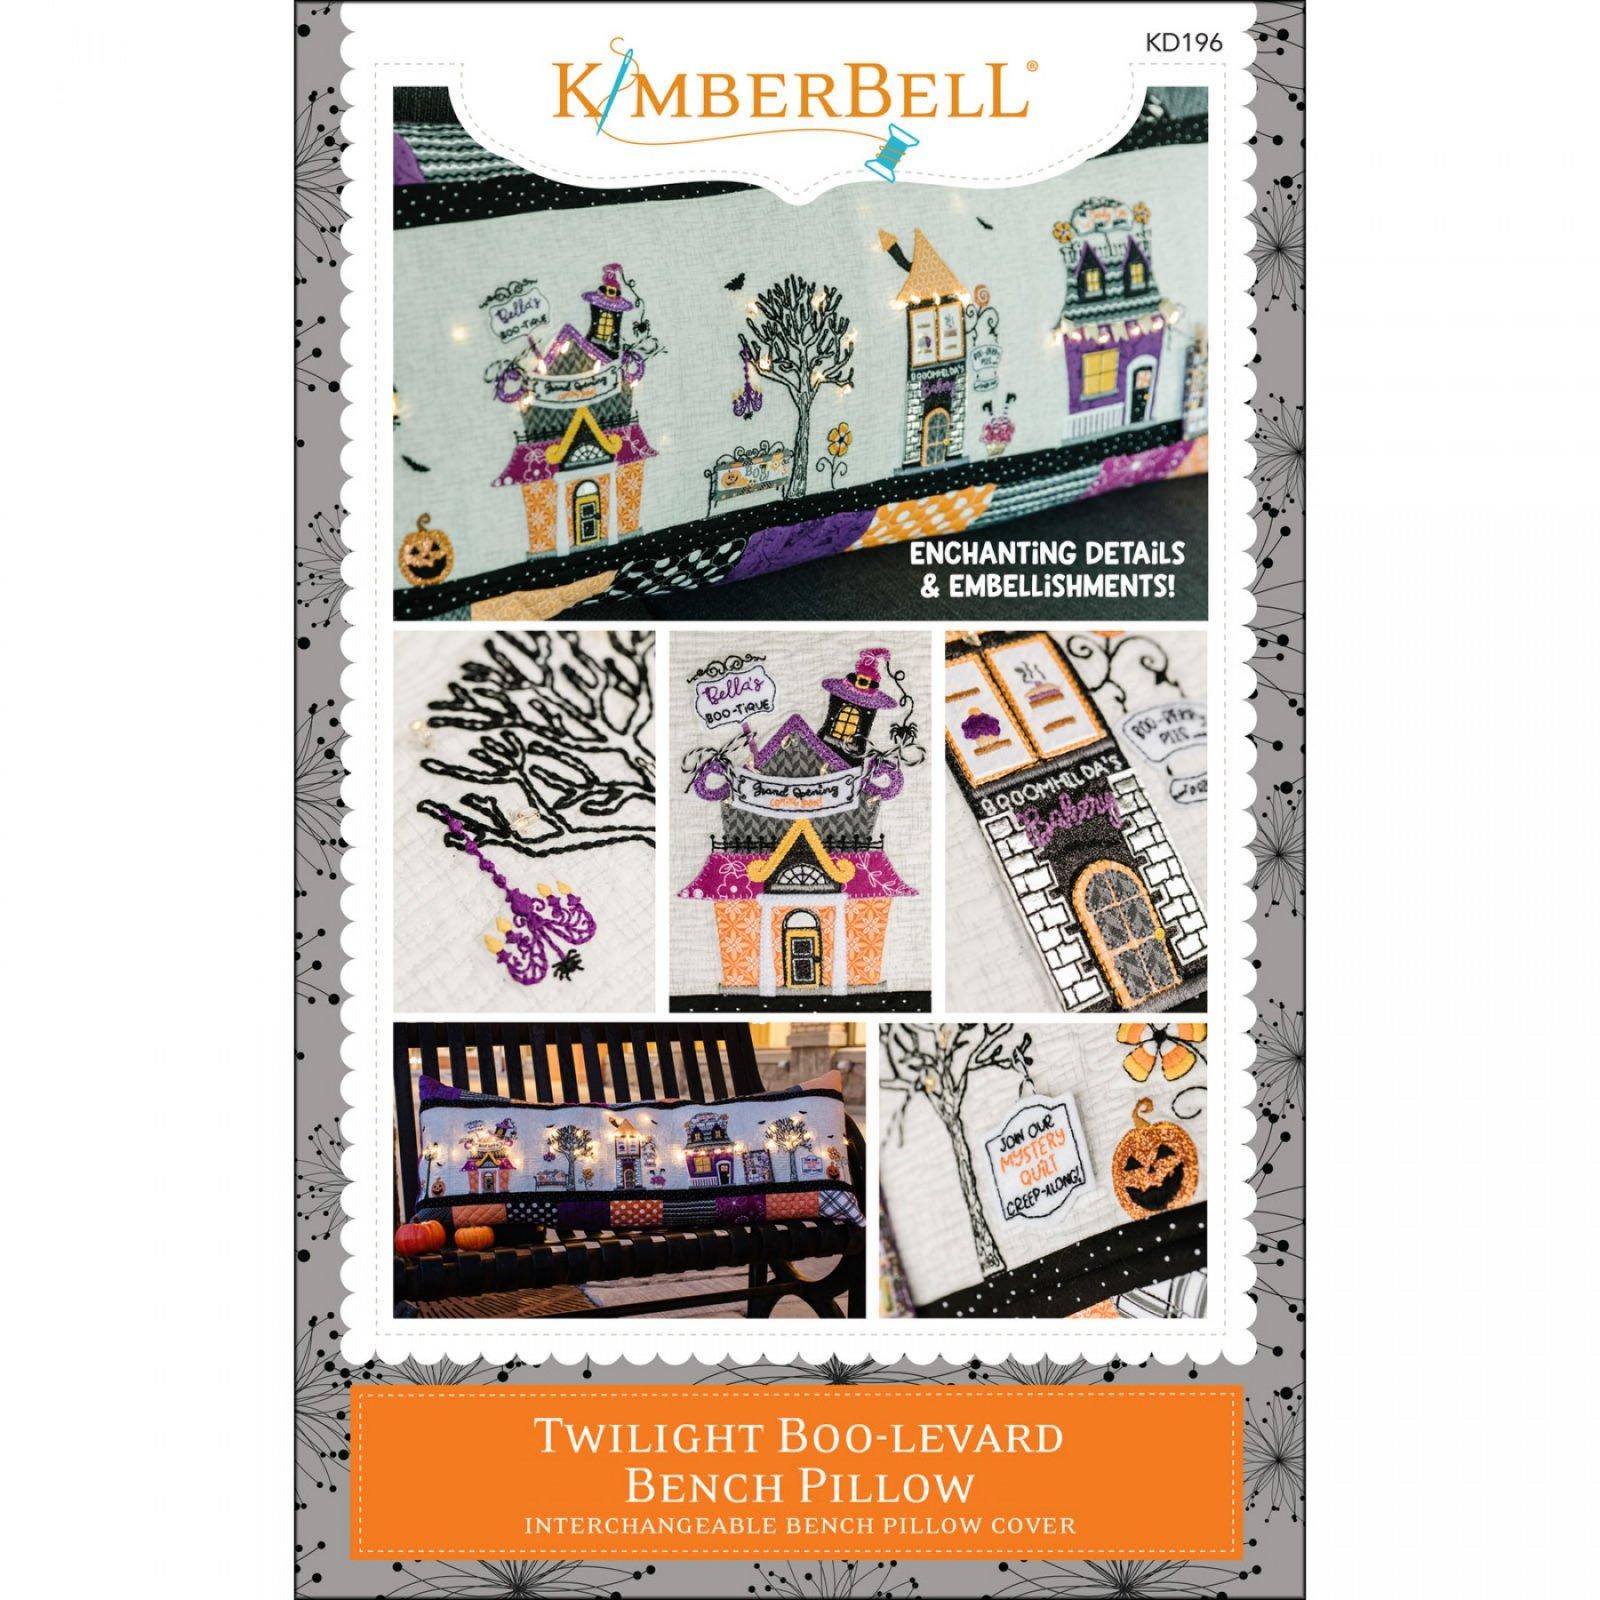 KD196 Kimberbell Twilight Boo-levard SV